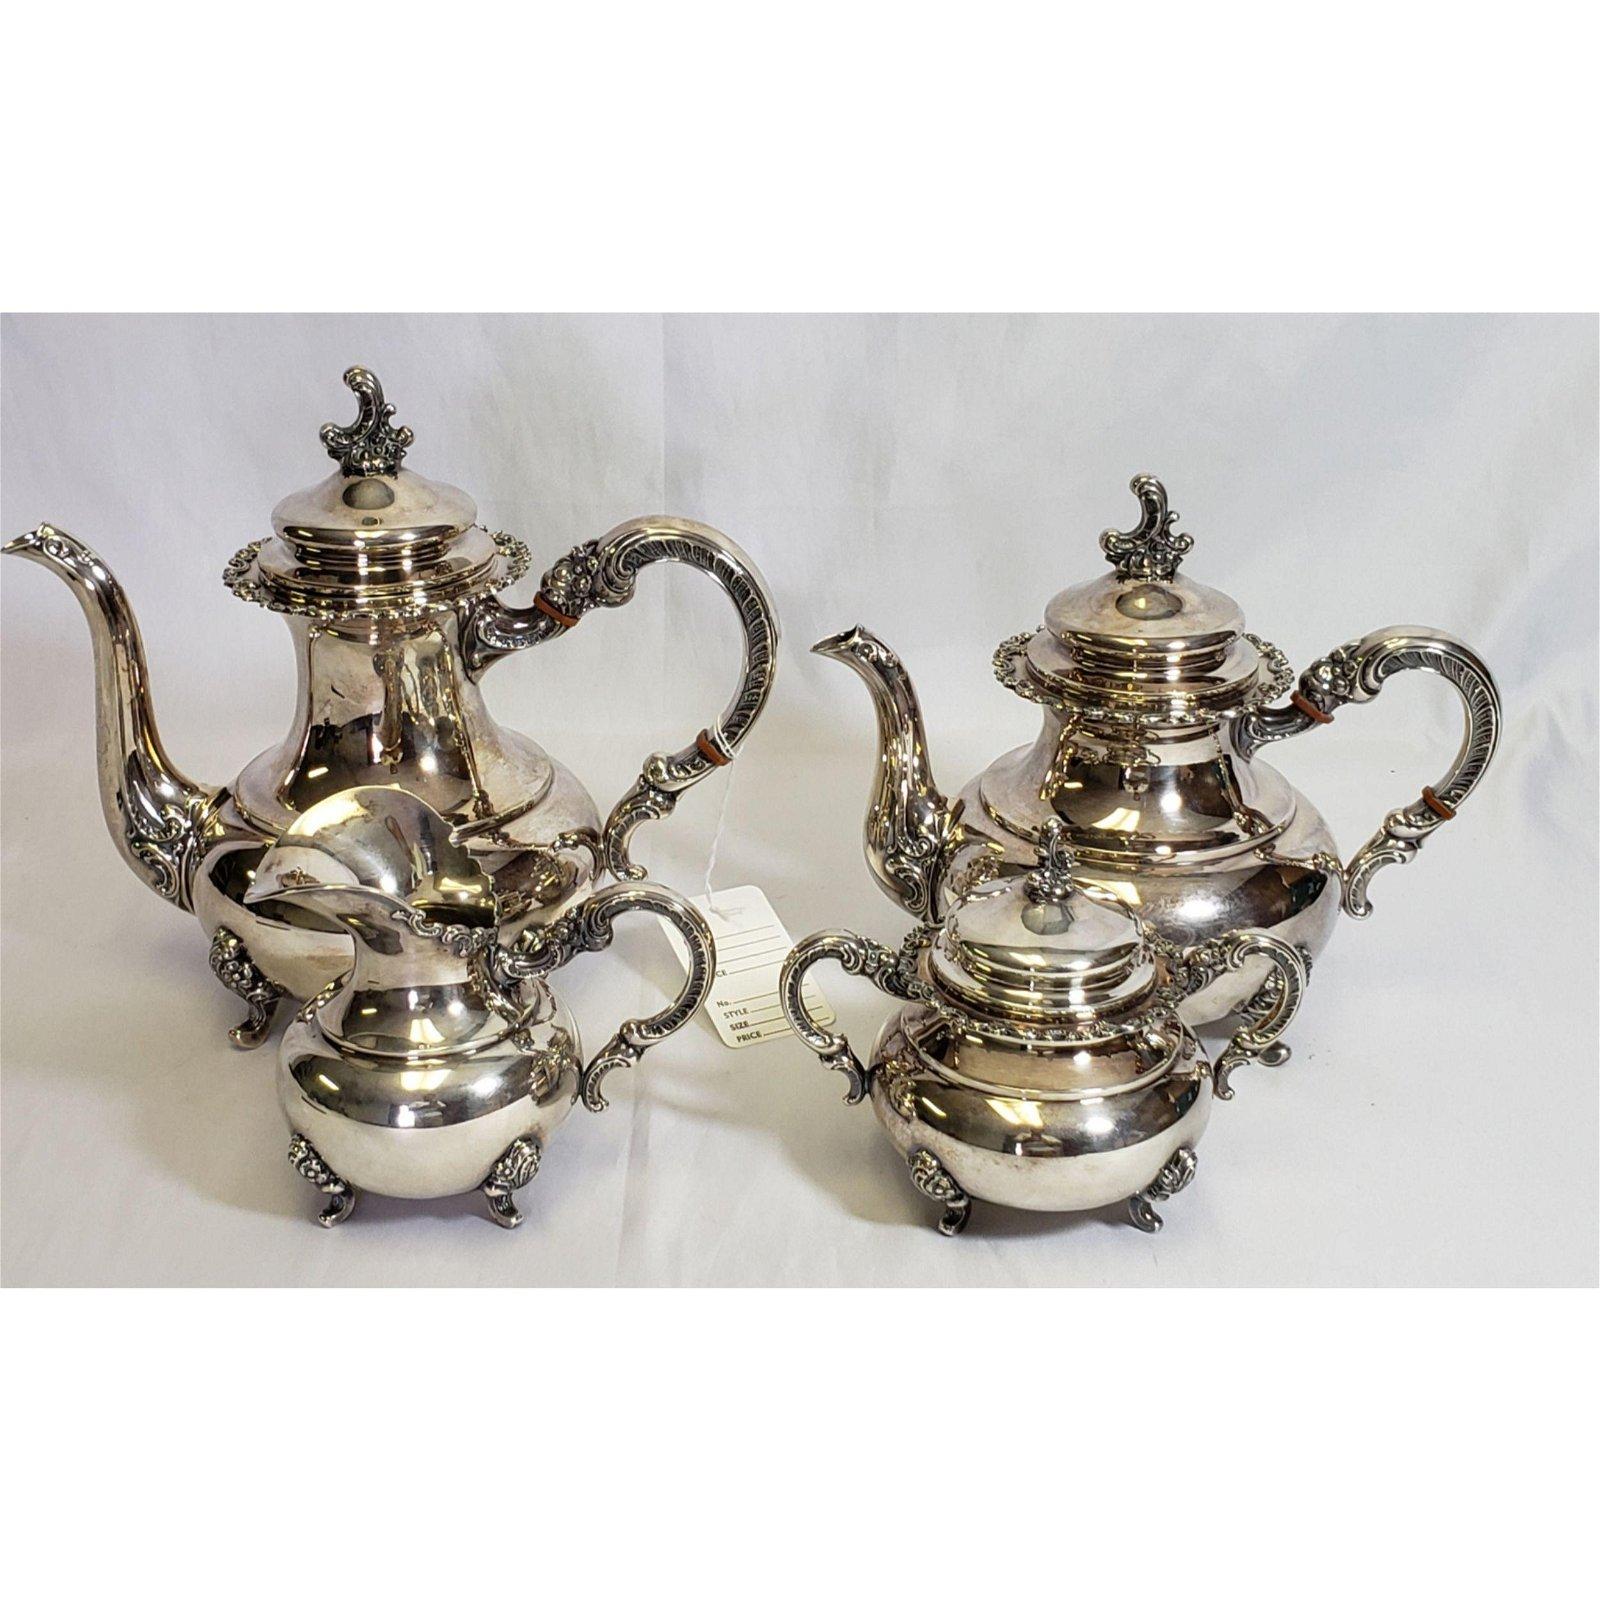 4 Piece Sterling Silver Tea Set 56.3 Troy Oz.